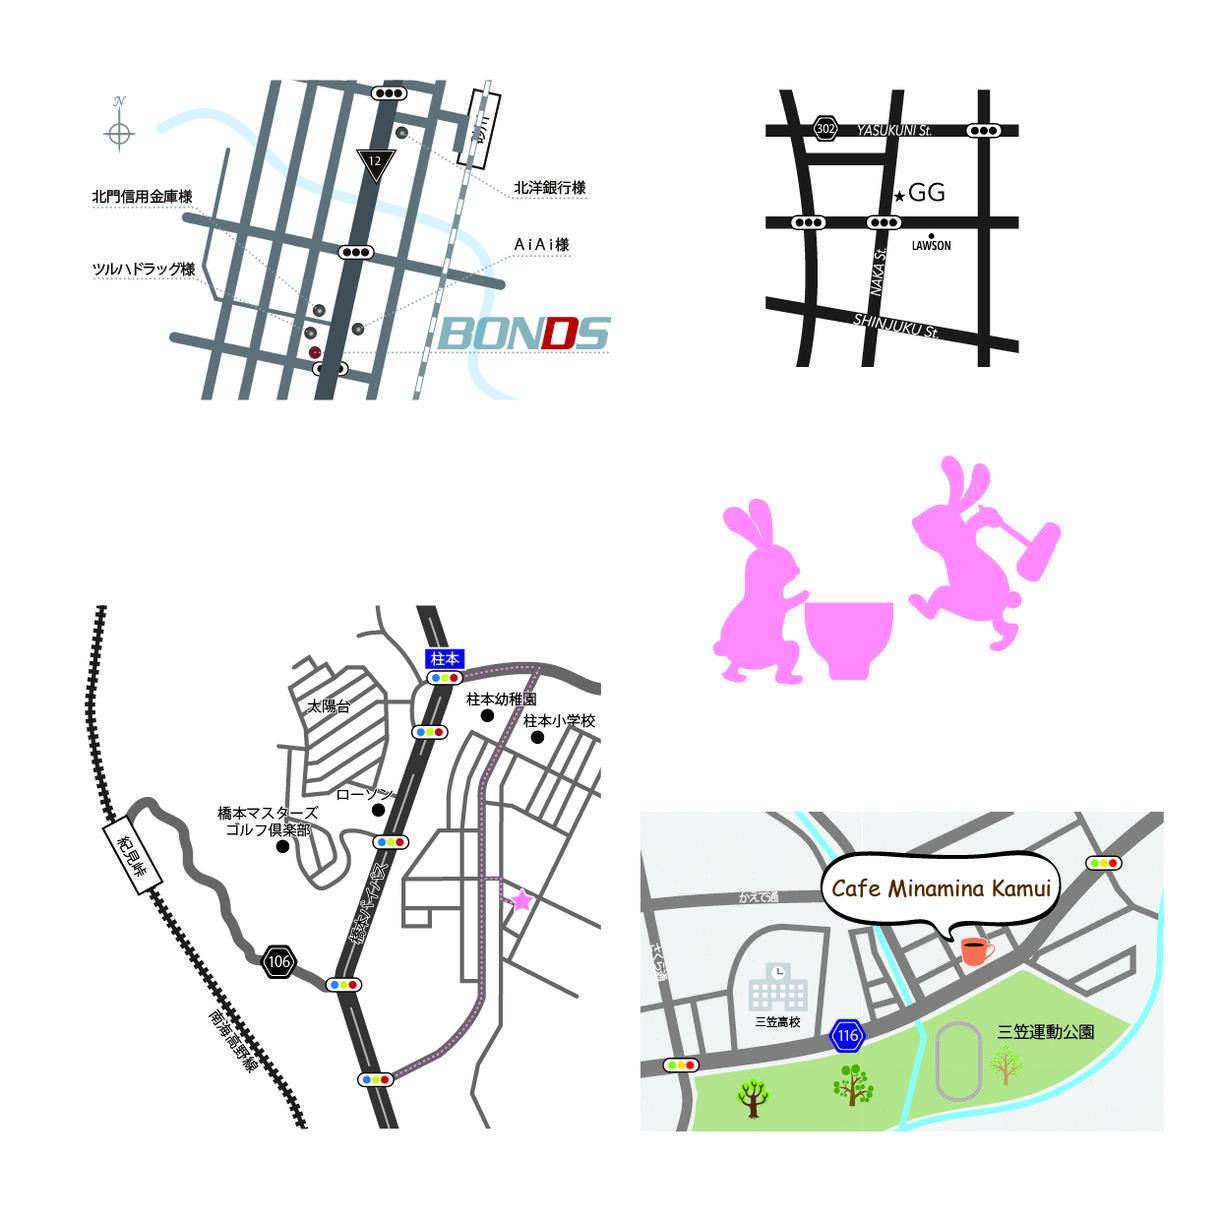 ★WEB用地図・紙媒体地図★地図チラシ名刺の地図を作成します! イメージ1